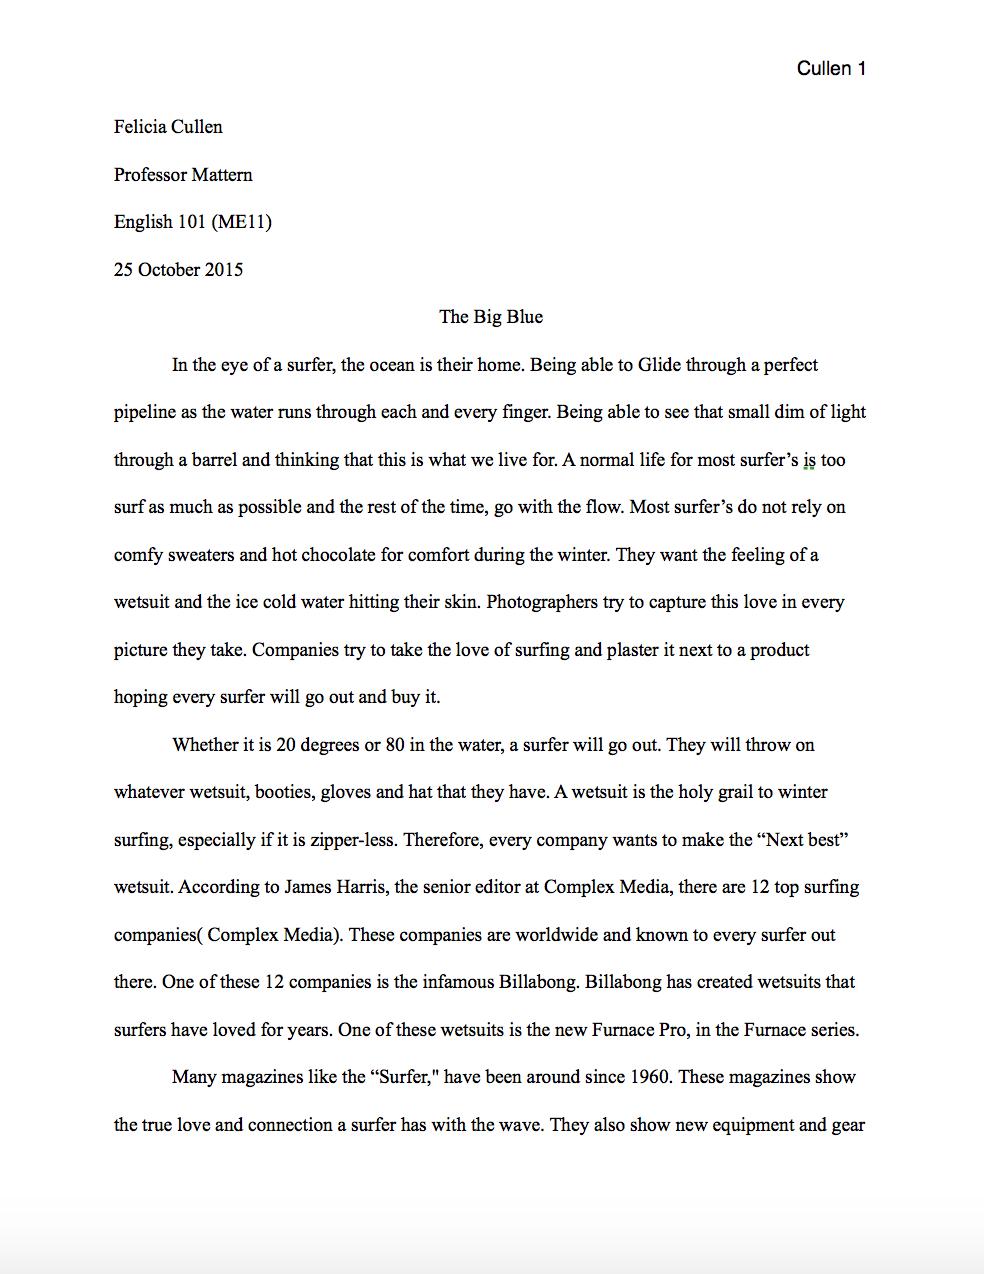 mla style essay format